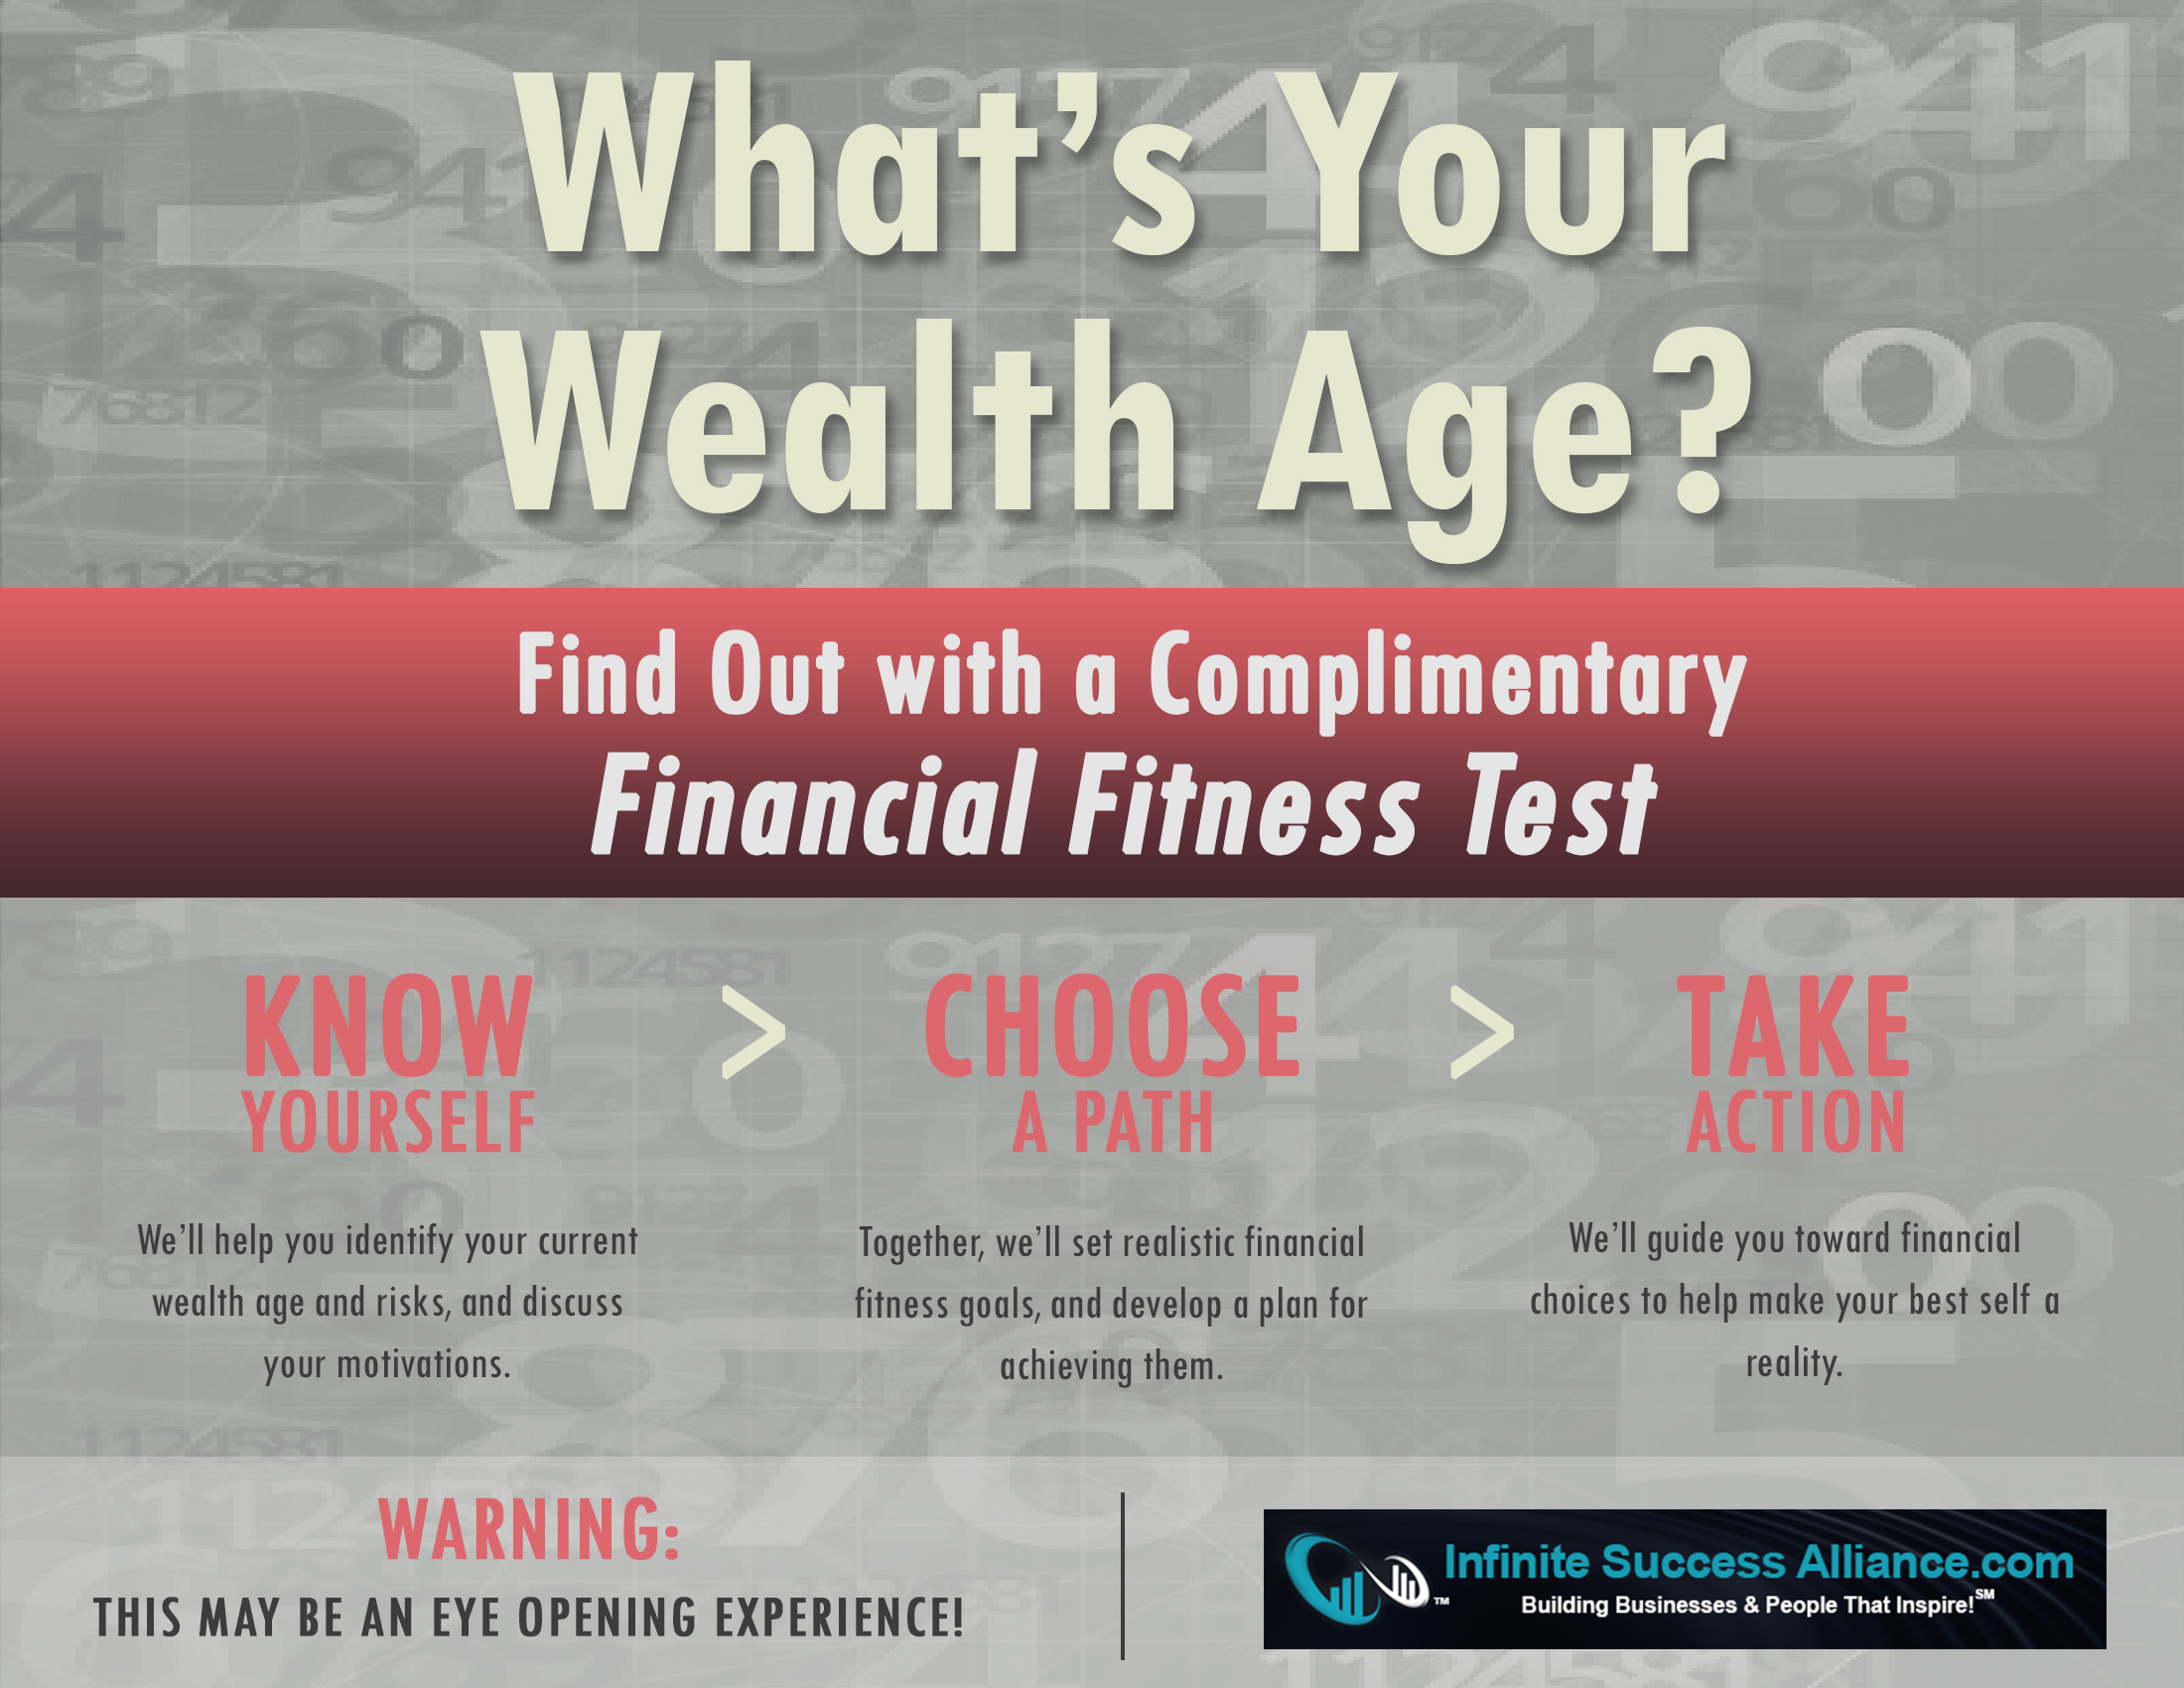 https://www.infinitesuccessalliance.com/wp-content/uploads/2014/02/Financial-Fitness-Test1.jpg